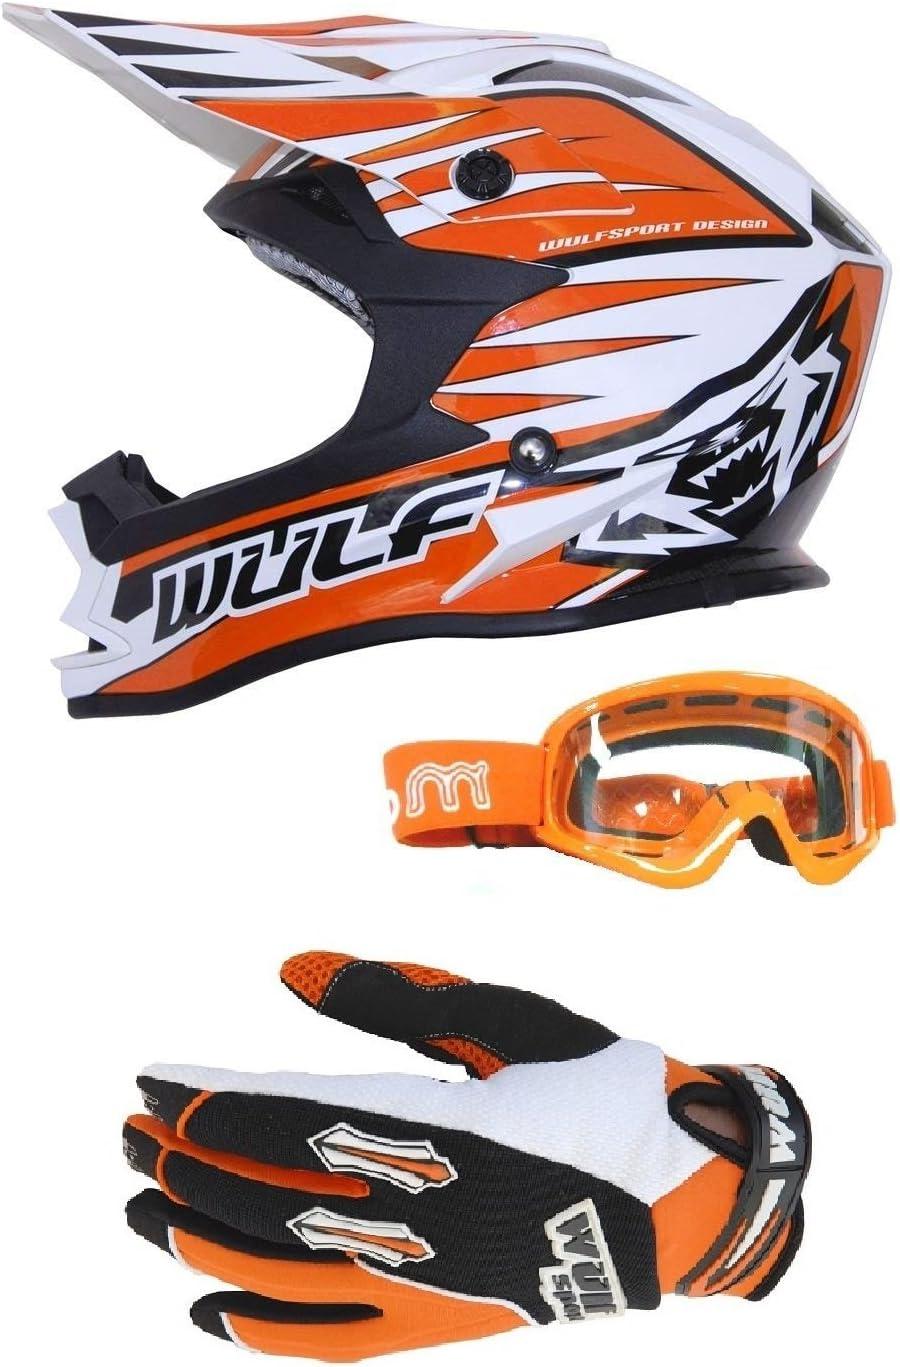 MOTORBIKE WULFSPORT ADVANCE ADULT MX OFF ROAD HELMET Motorbike Motocross Quad ATV Enduro PIT Sport WUlf Stratos Gloves Moto X1 Goggles